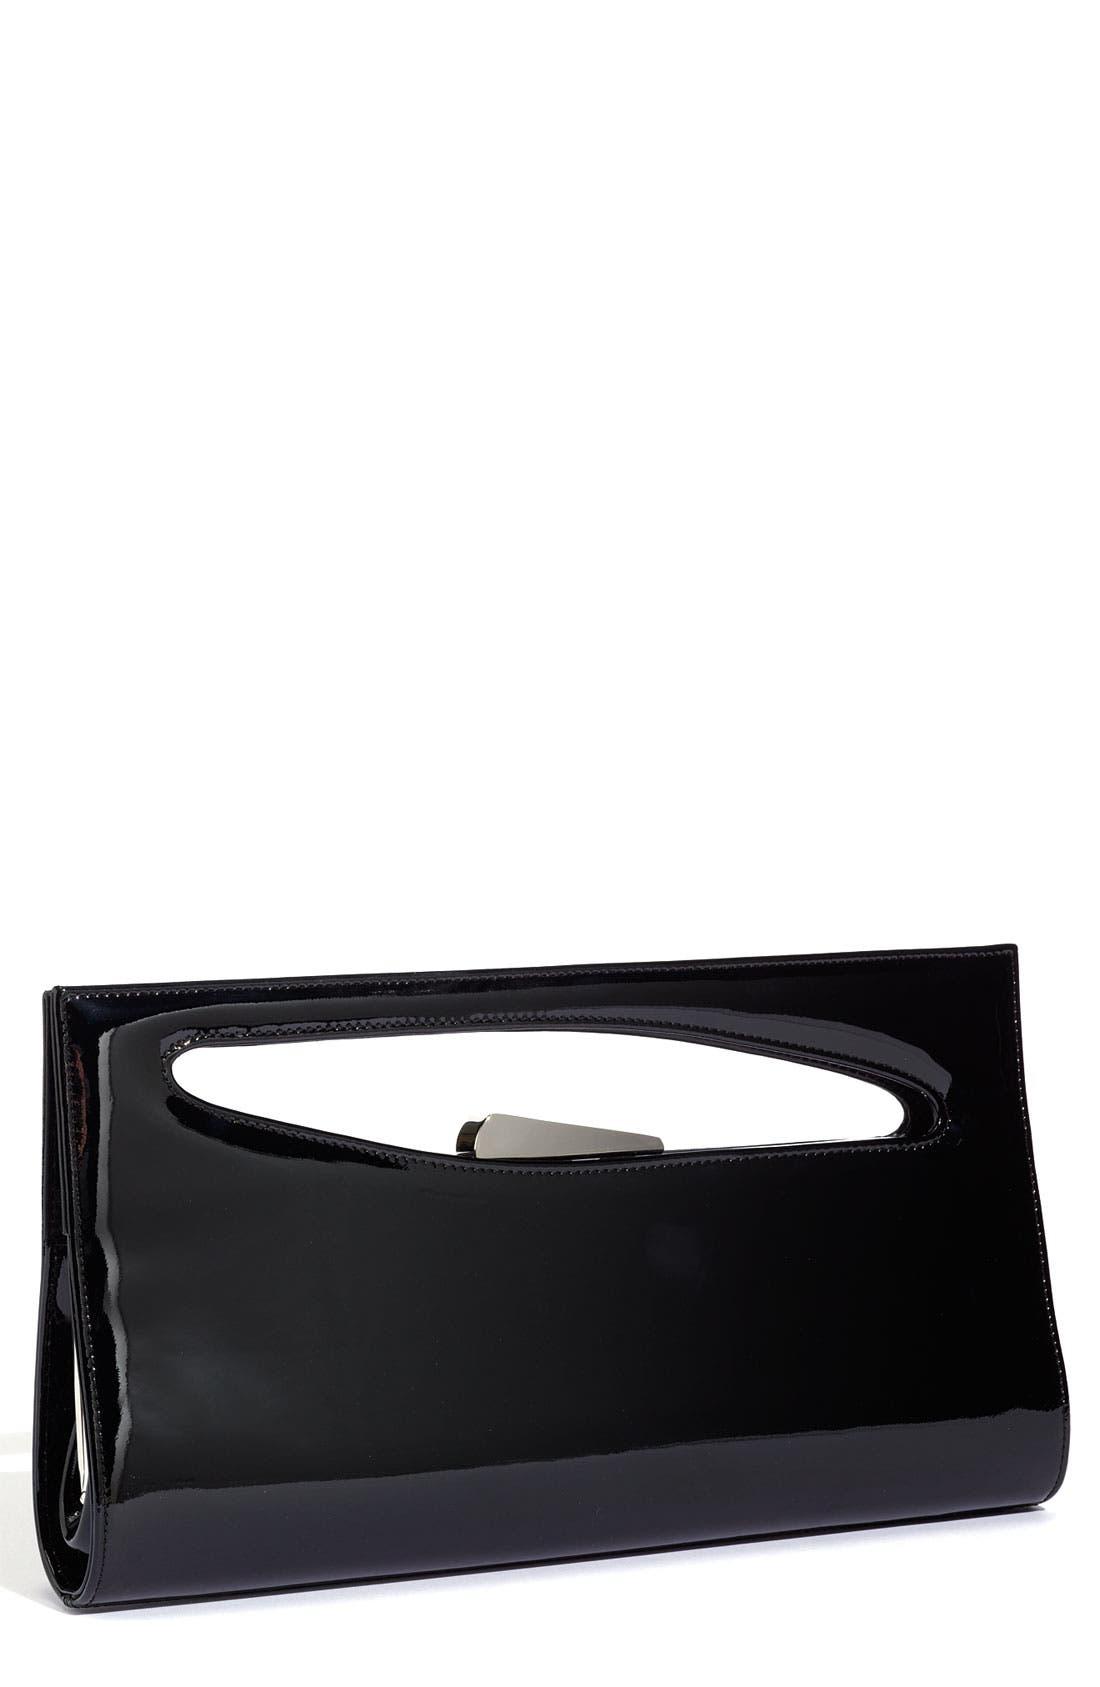 STUART WEITZMAN,                             'Grip' Handbag,                             Main thumbnail 1, color,                             002